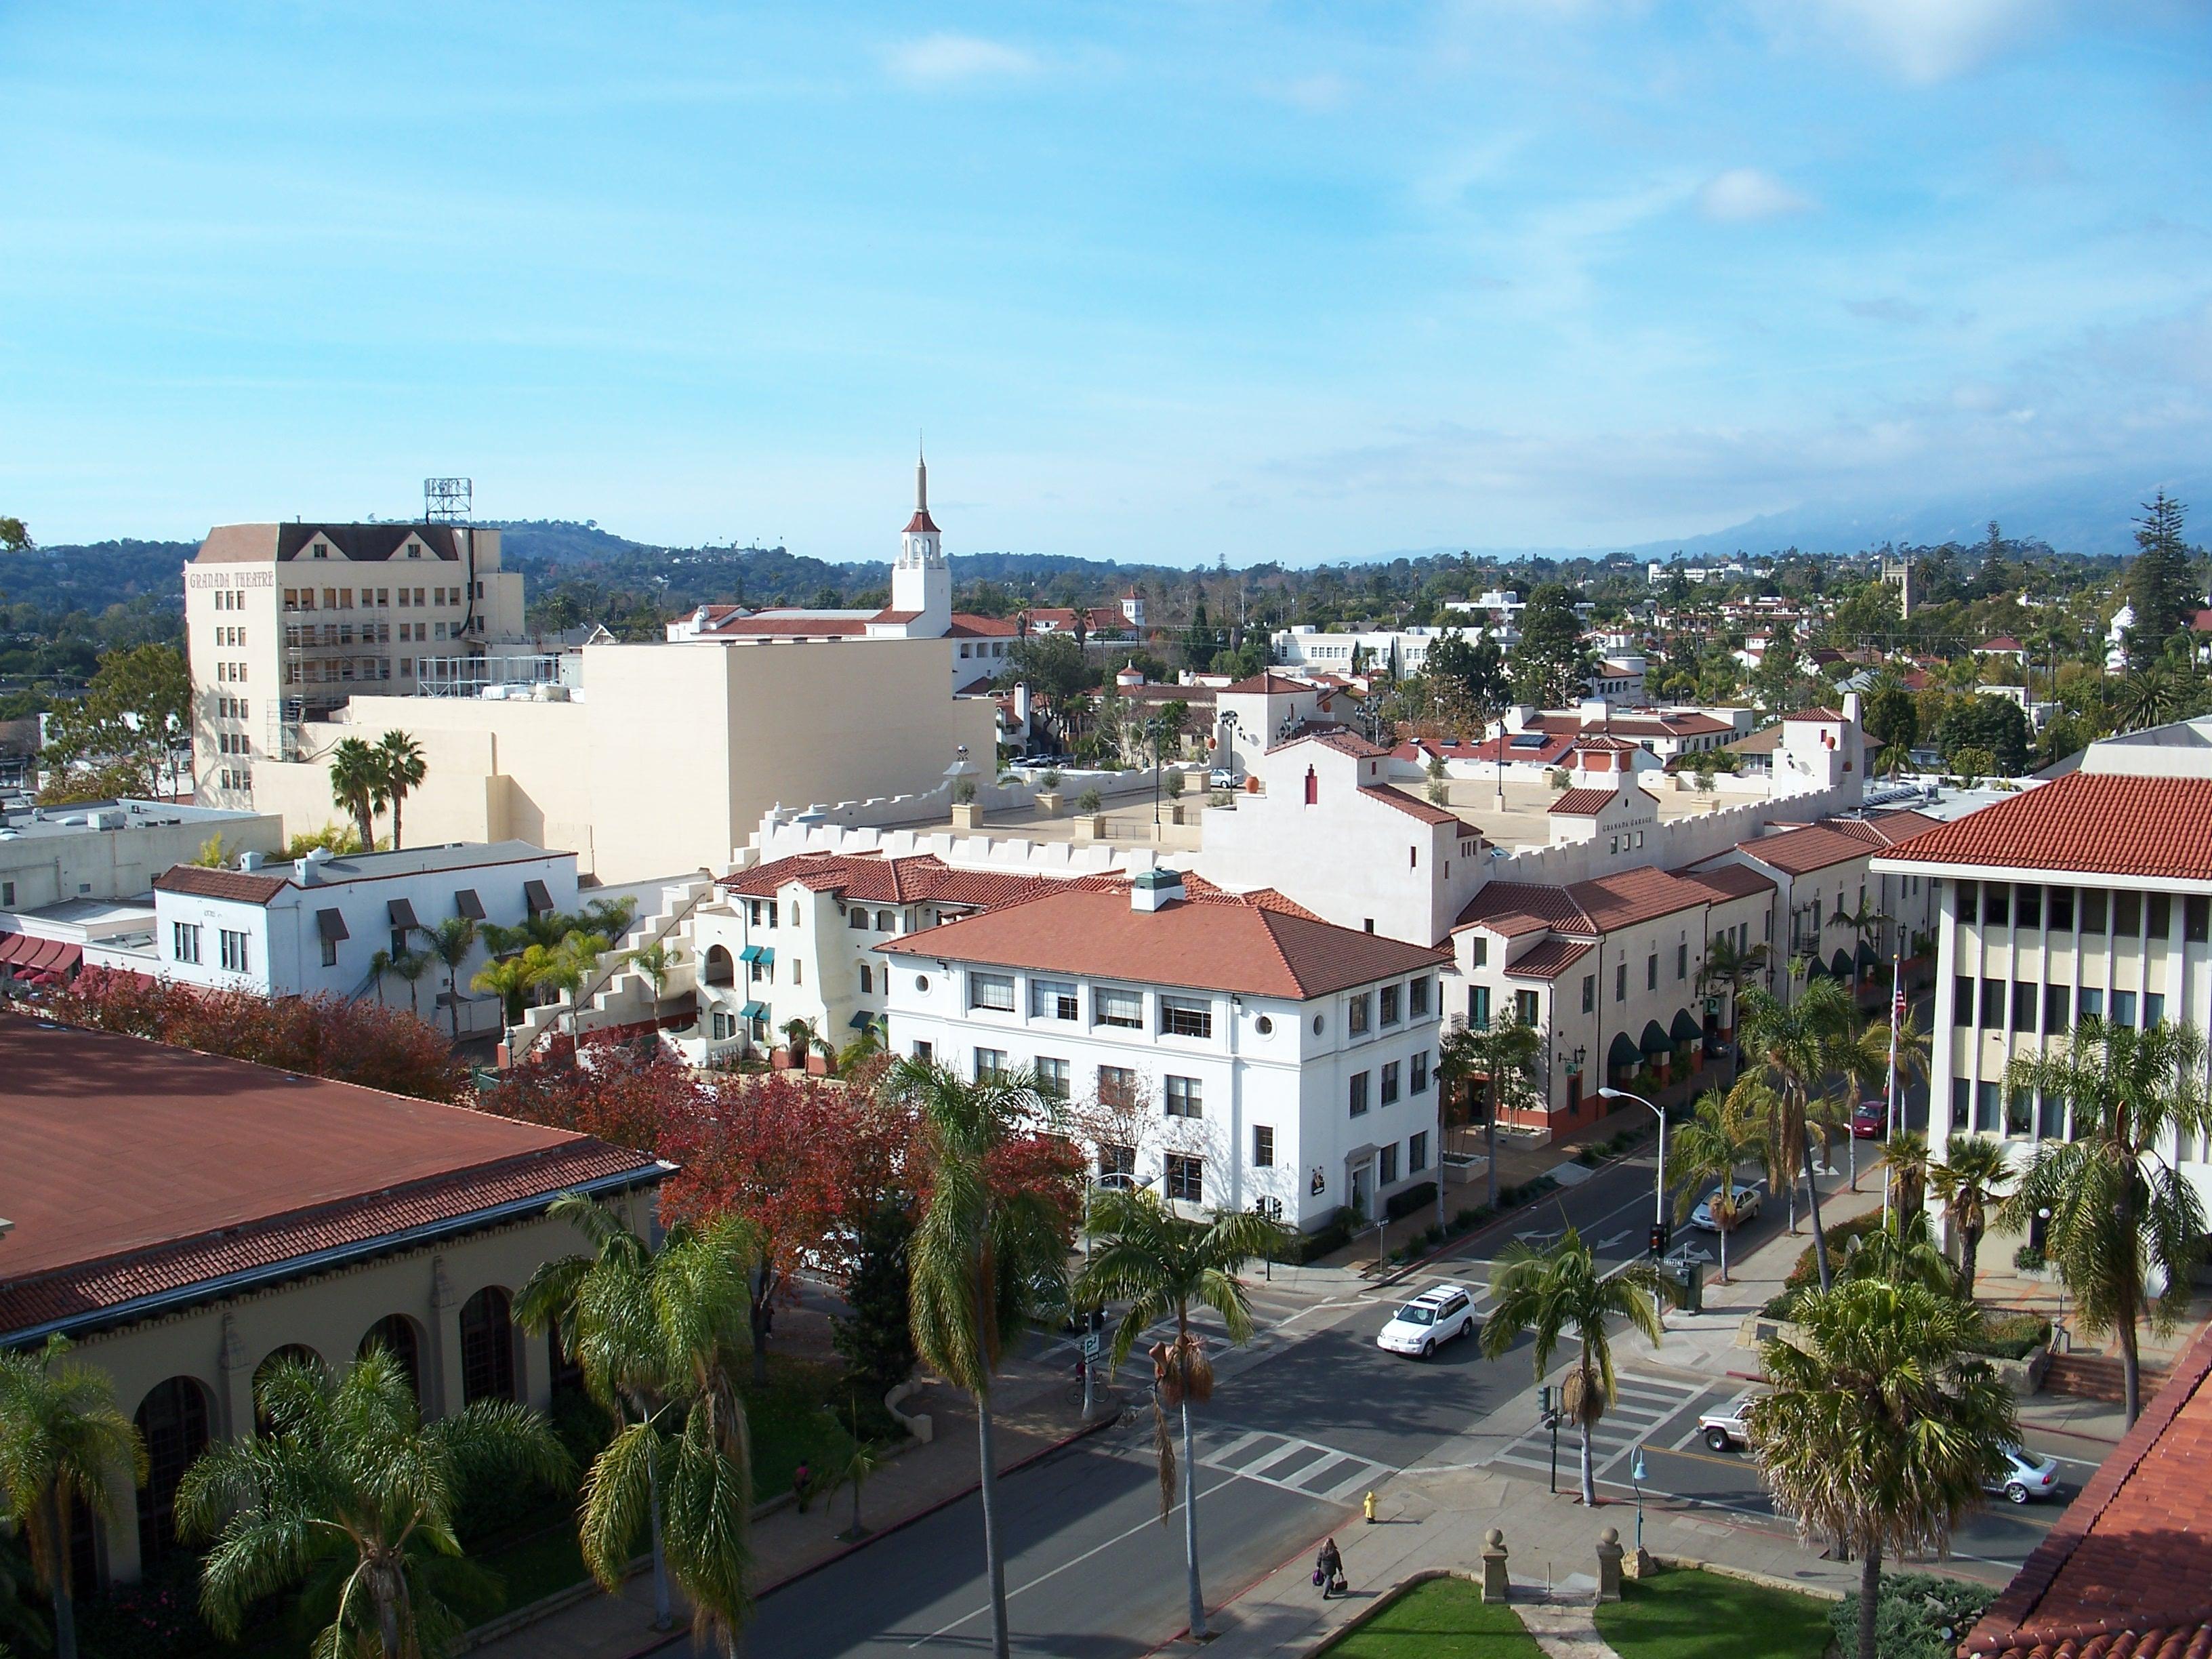 santa barbara california location  santa  get free image